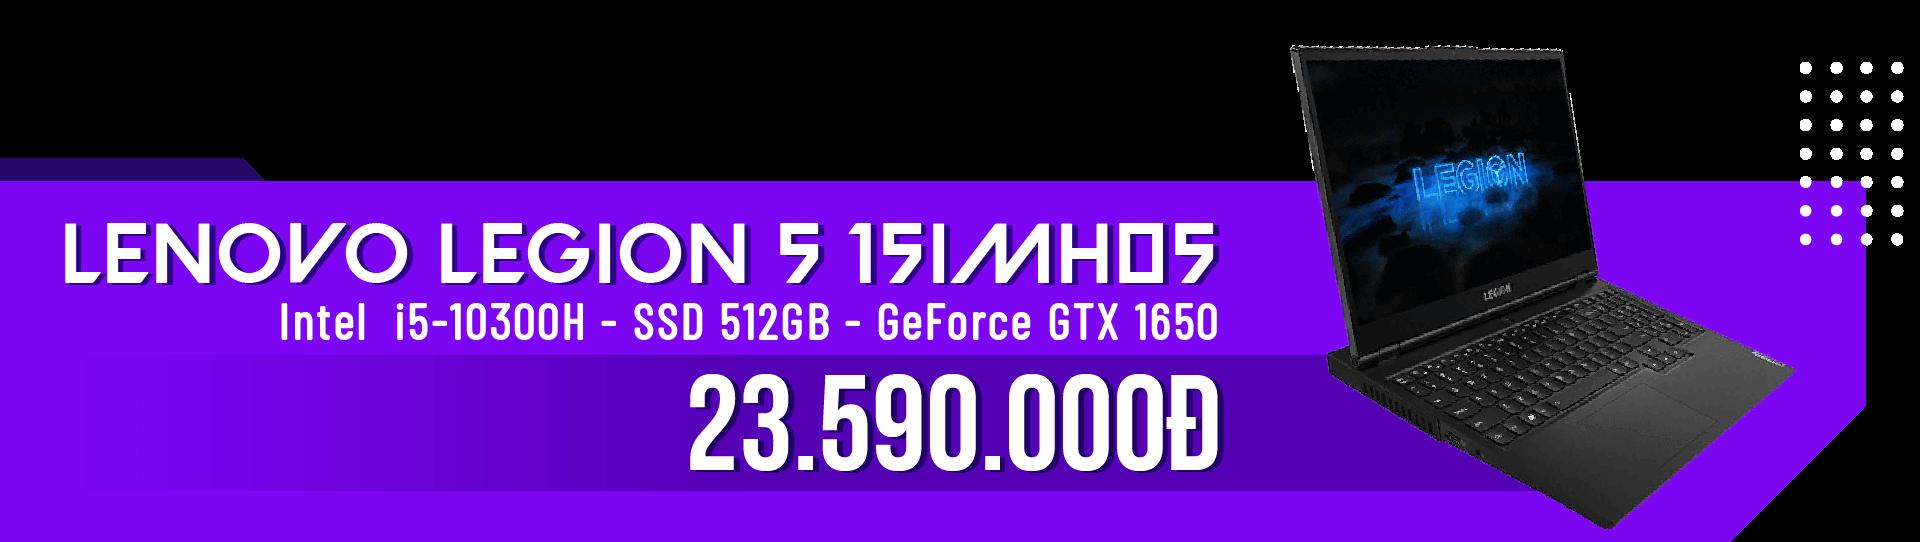 Artboard 1 1 - Ưu đãi Laptop Gaming - Ben Computer